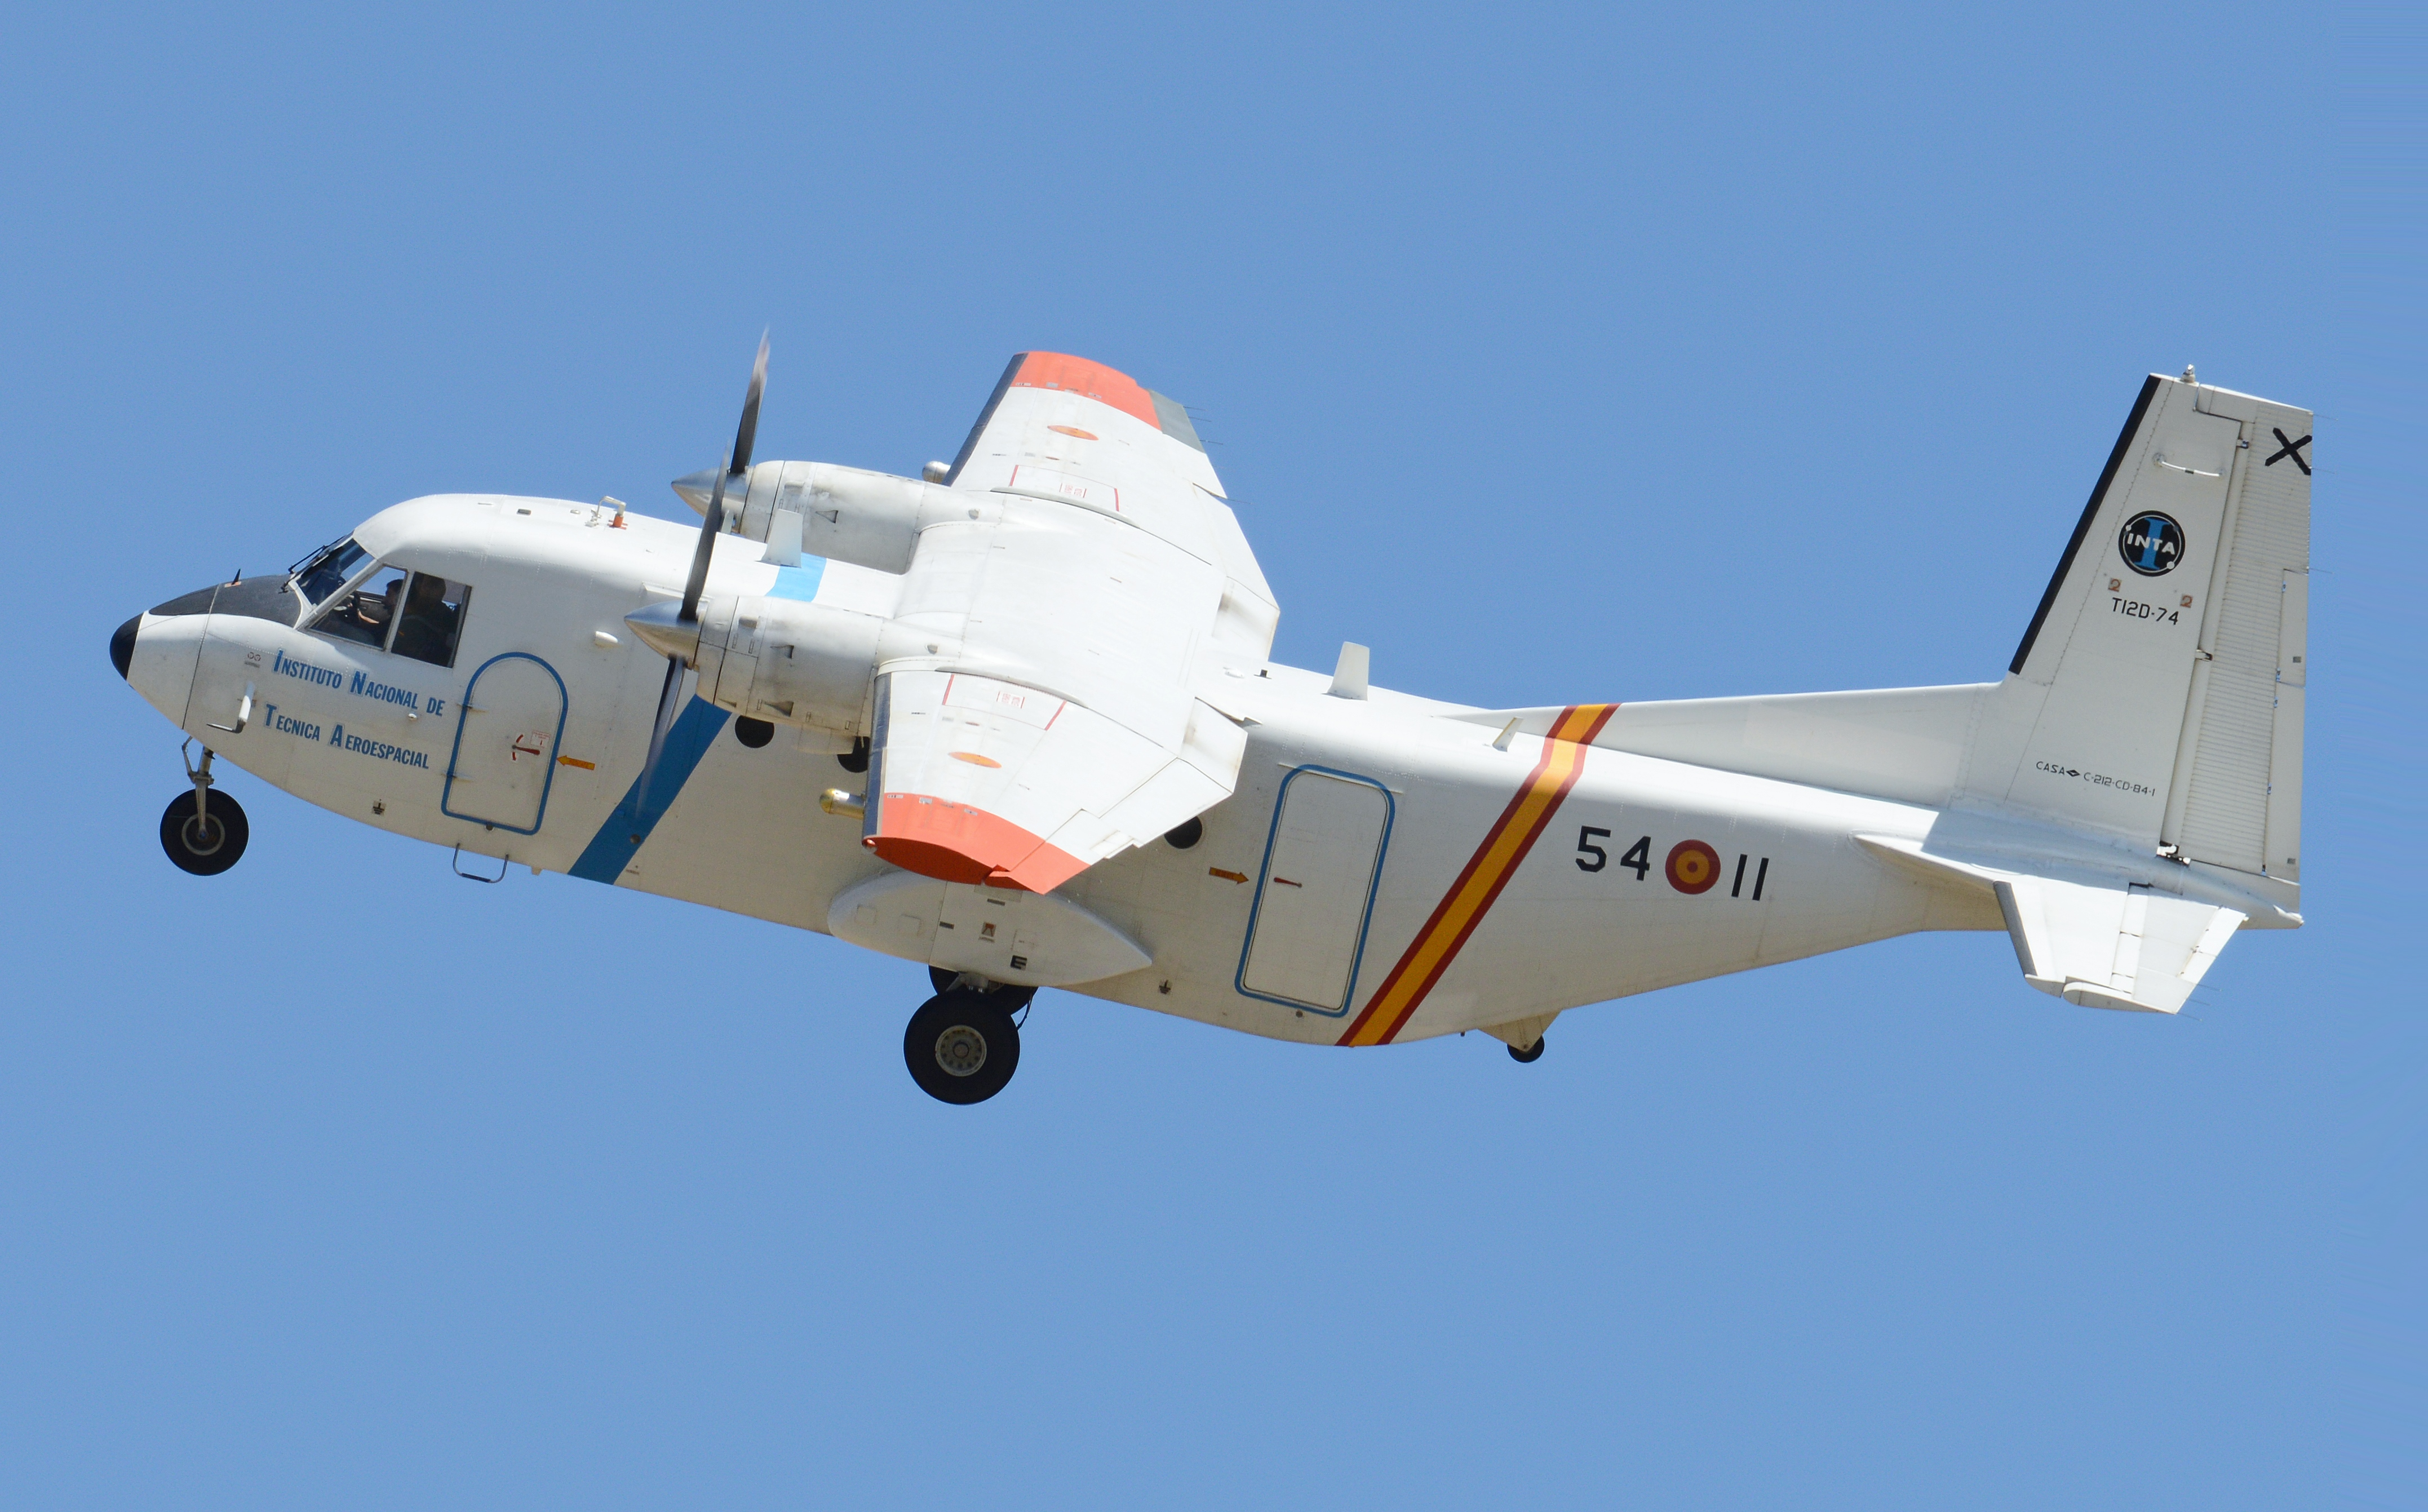 CASA C-212 Aviocar - Wikipedia